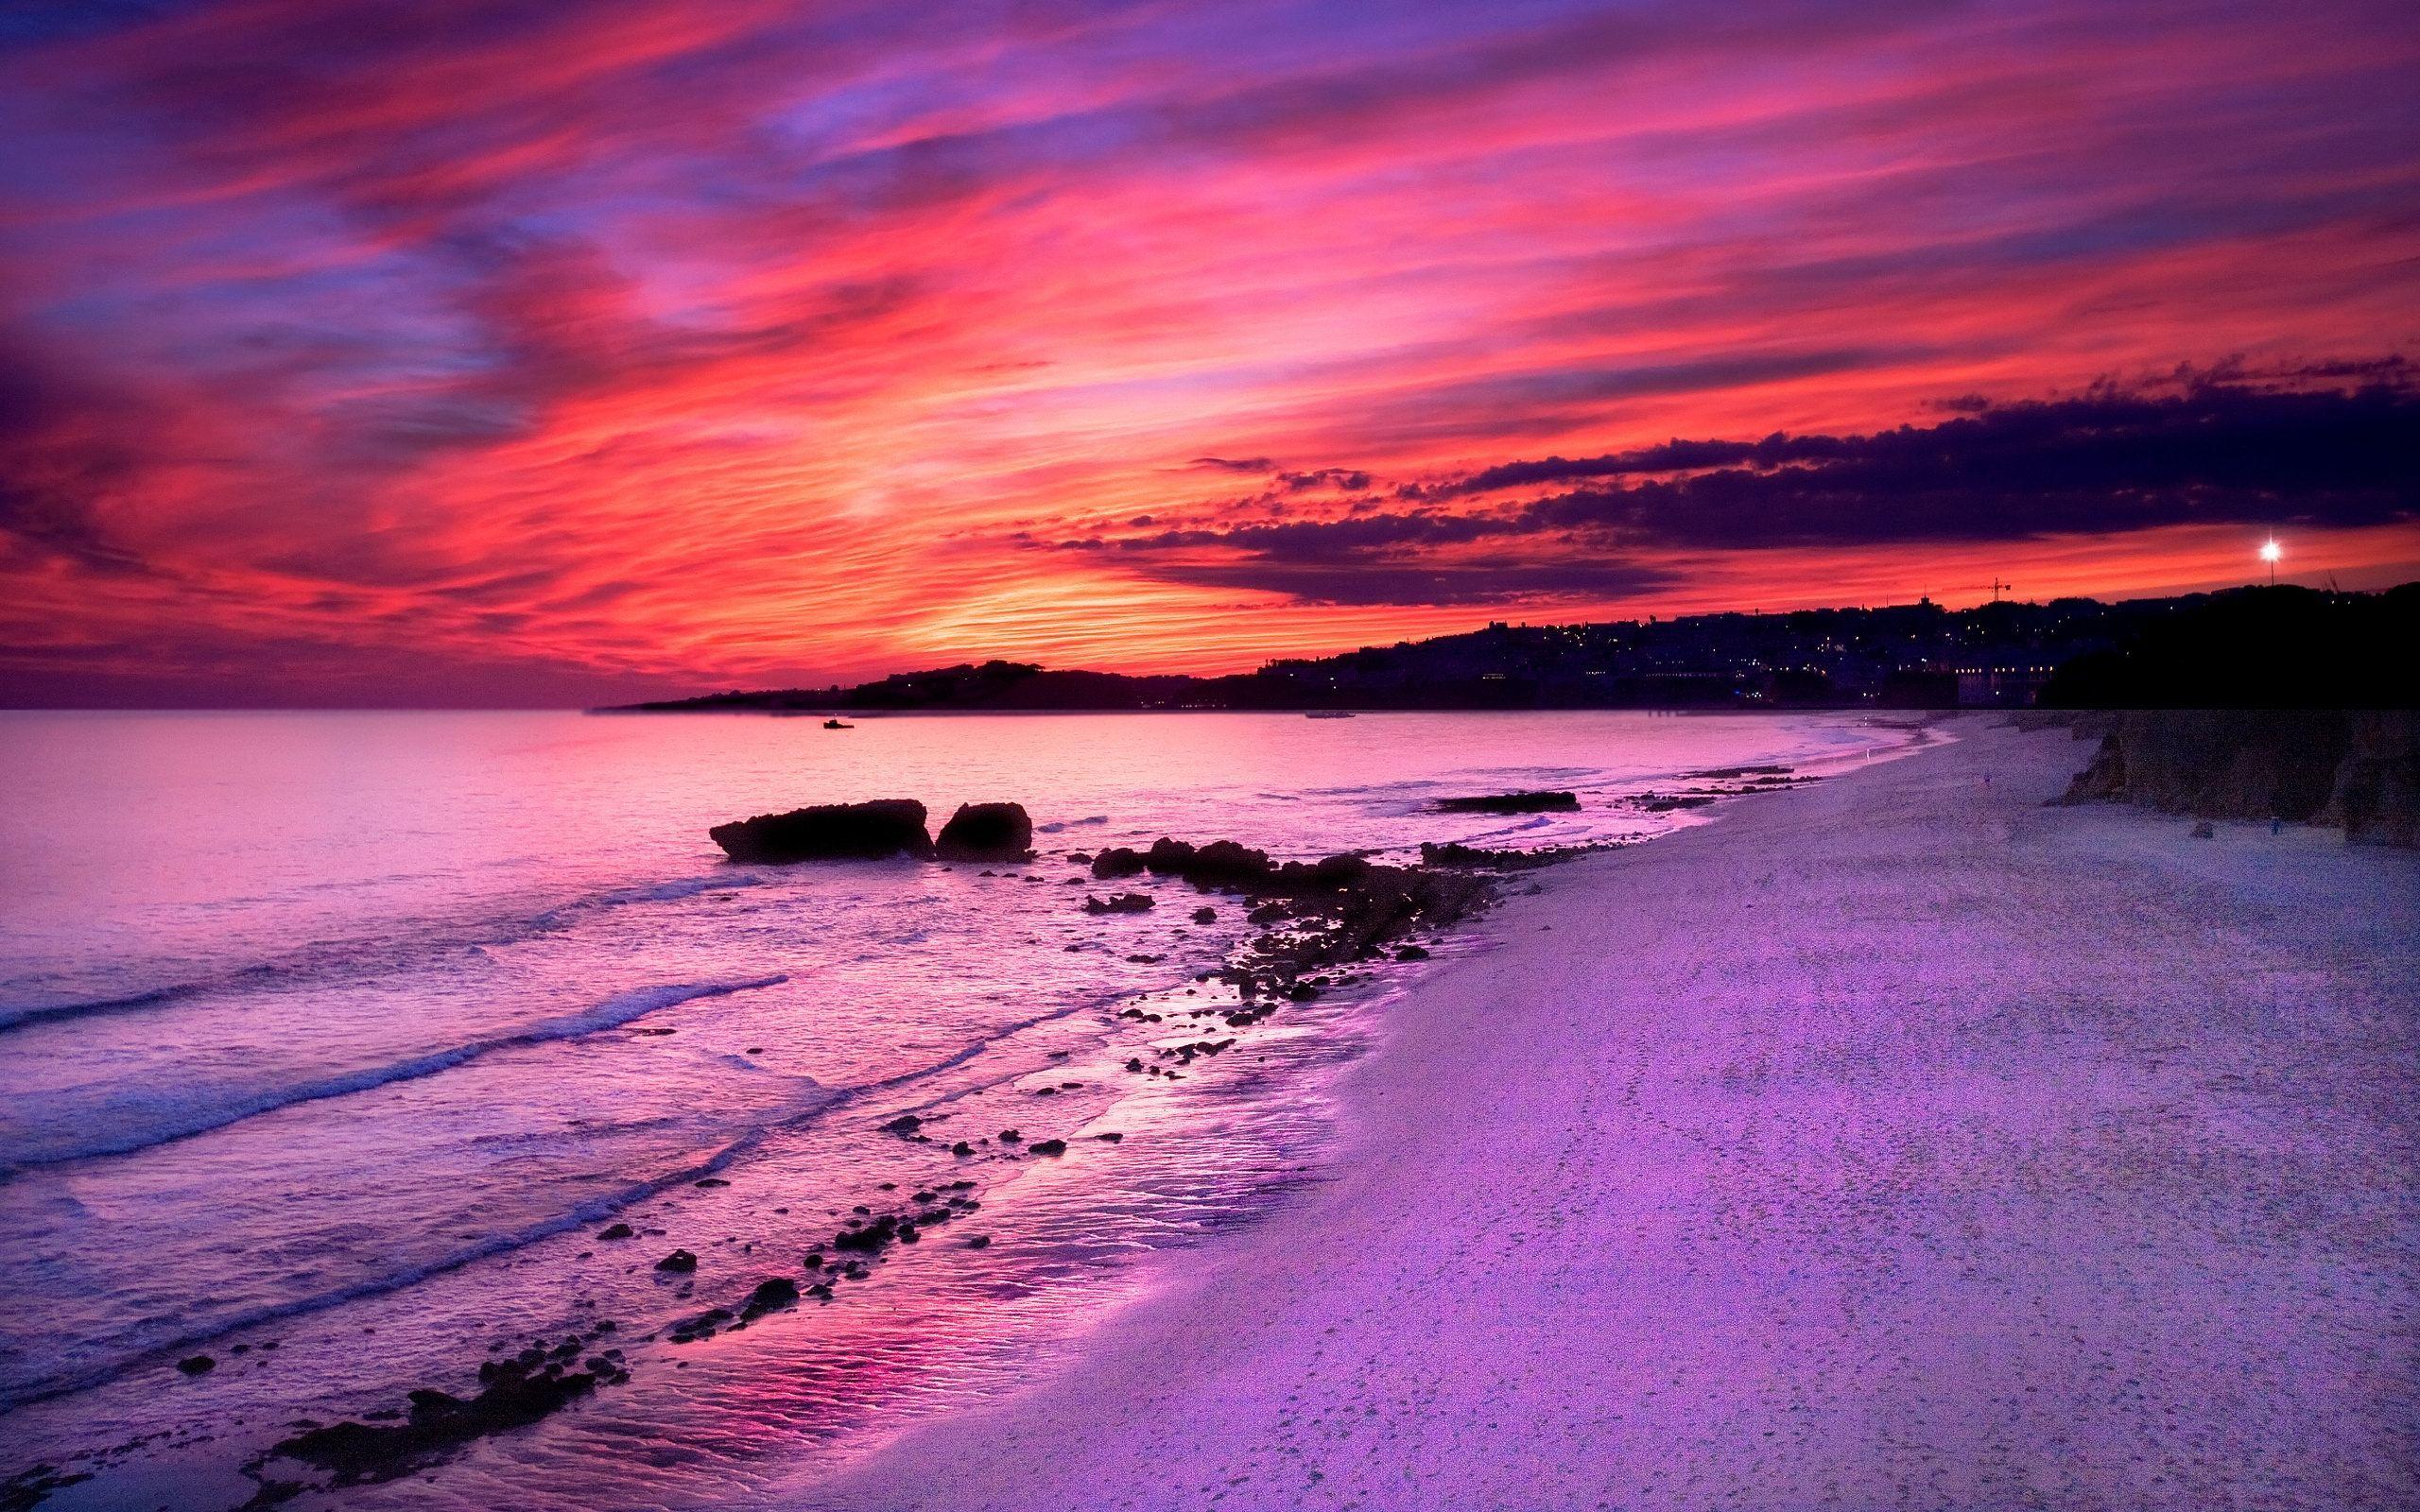 the beautiful seaside scenery - photo #23